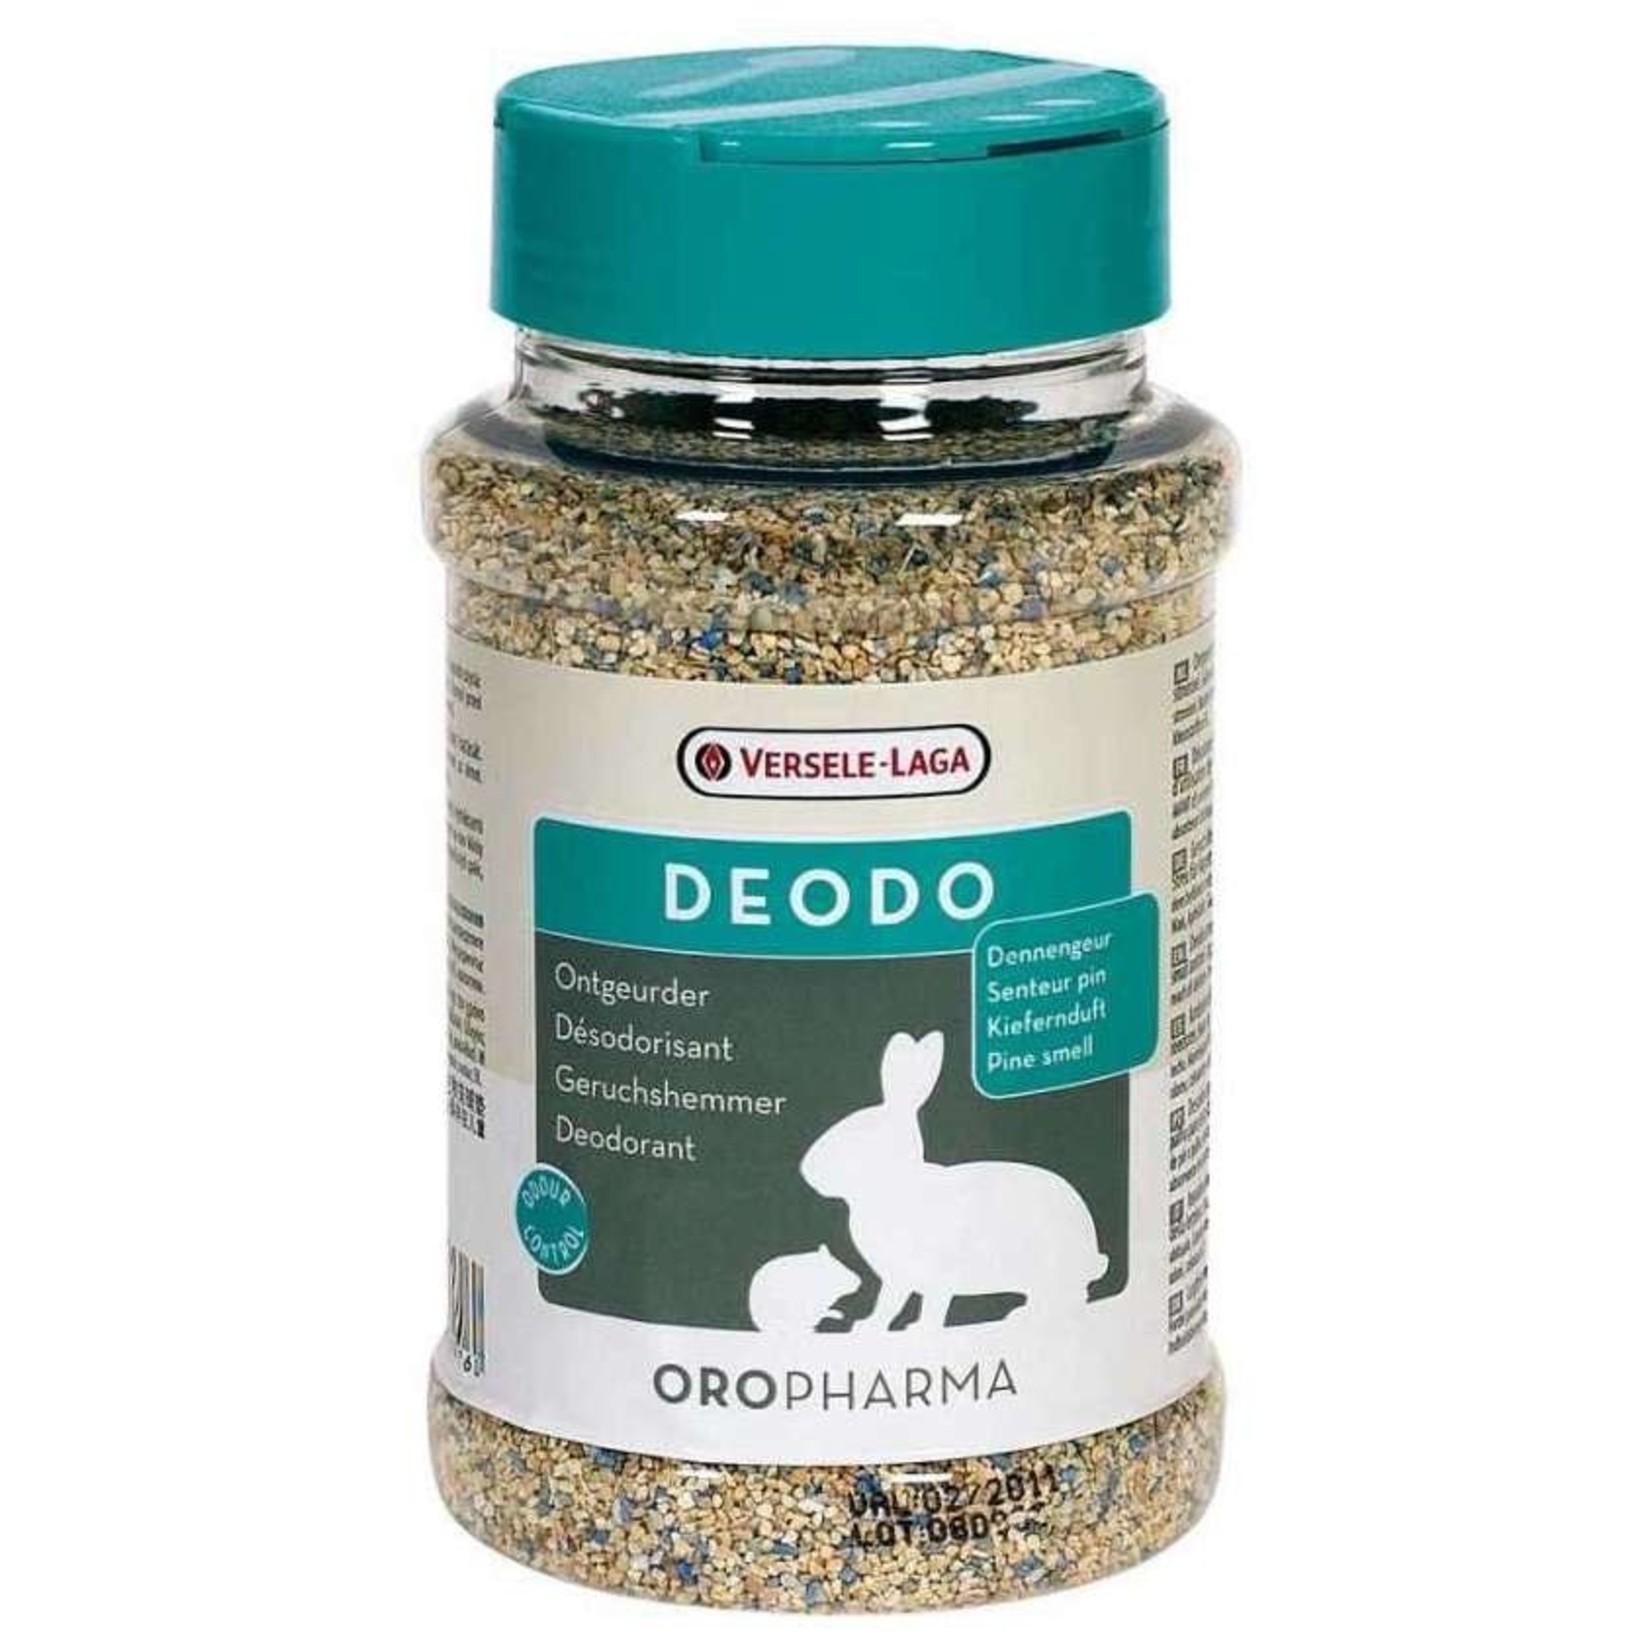 Versele-Laga Deodo Pine Scent Badding Deodorizer 230g